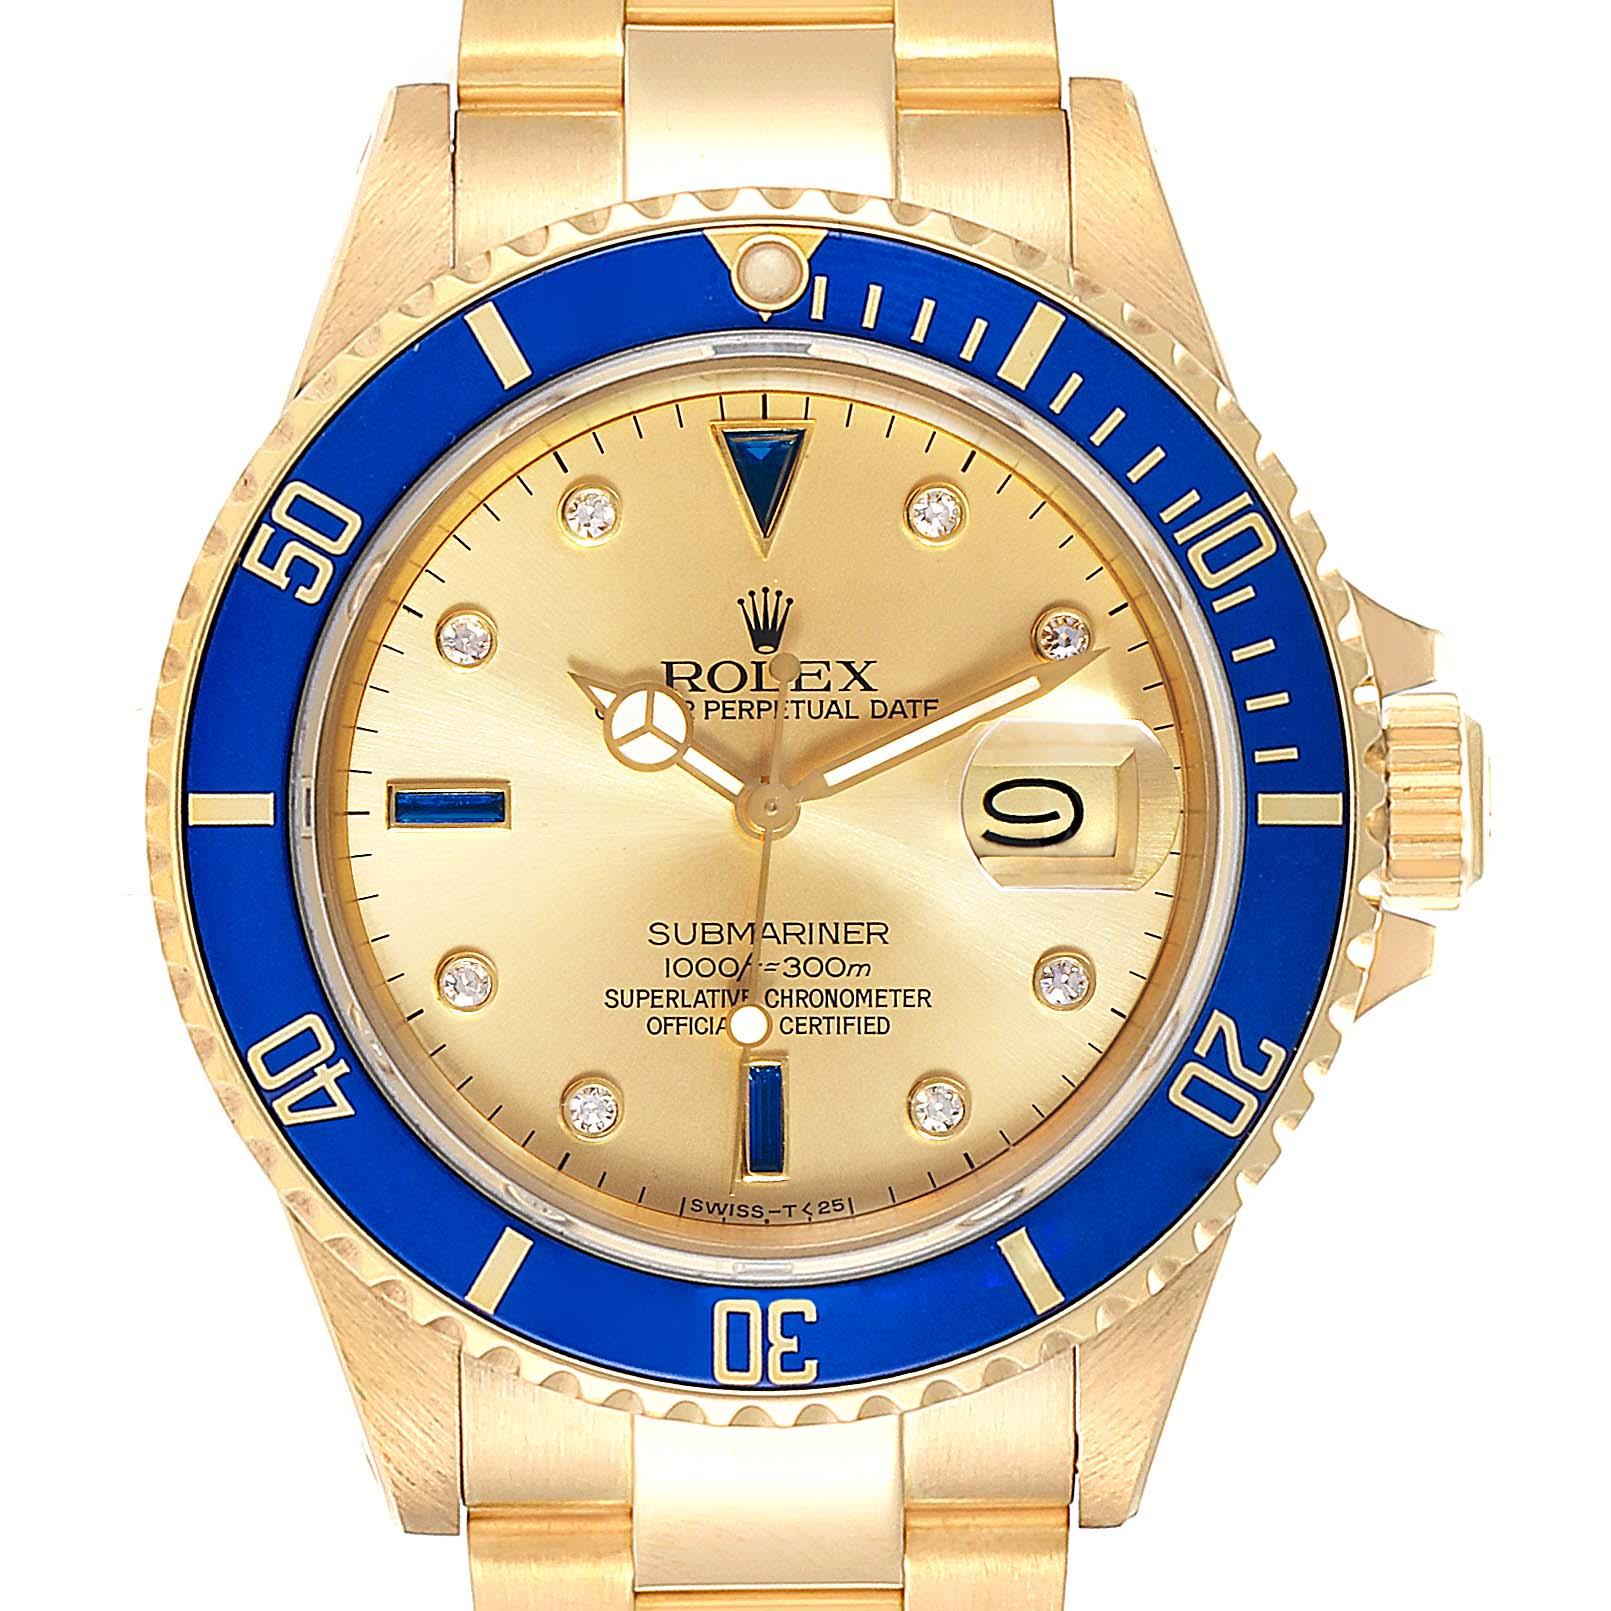 Rolex Submariner Yellow Gold Diamond Sapphire Serti Dial Watch 16808